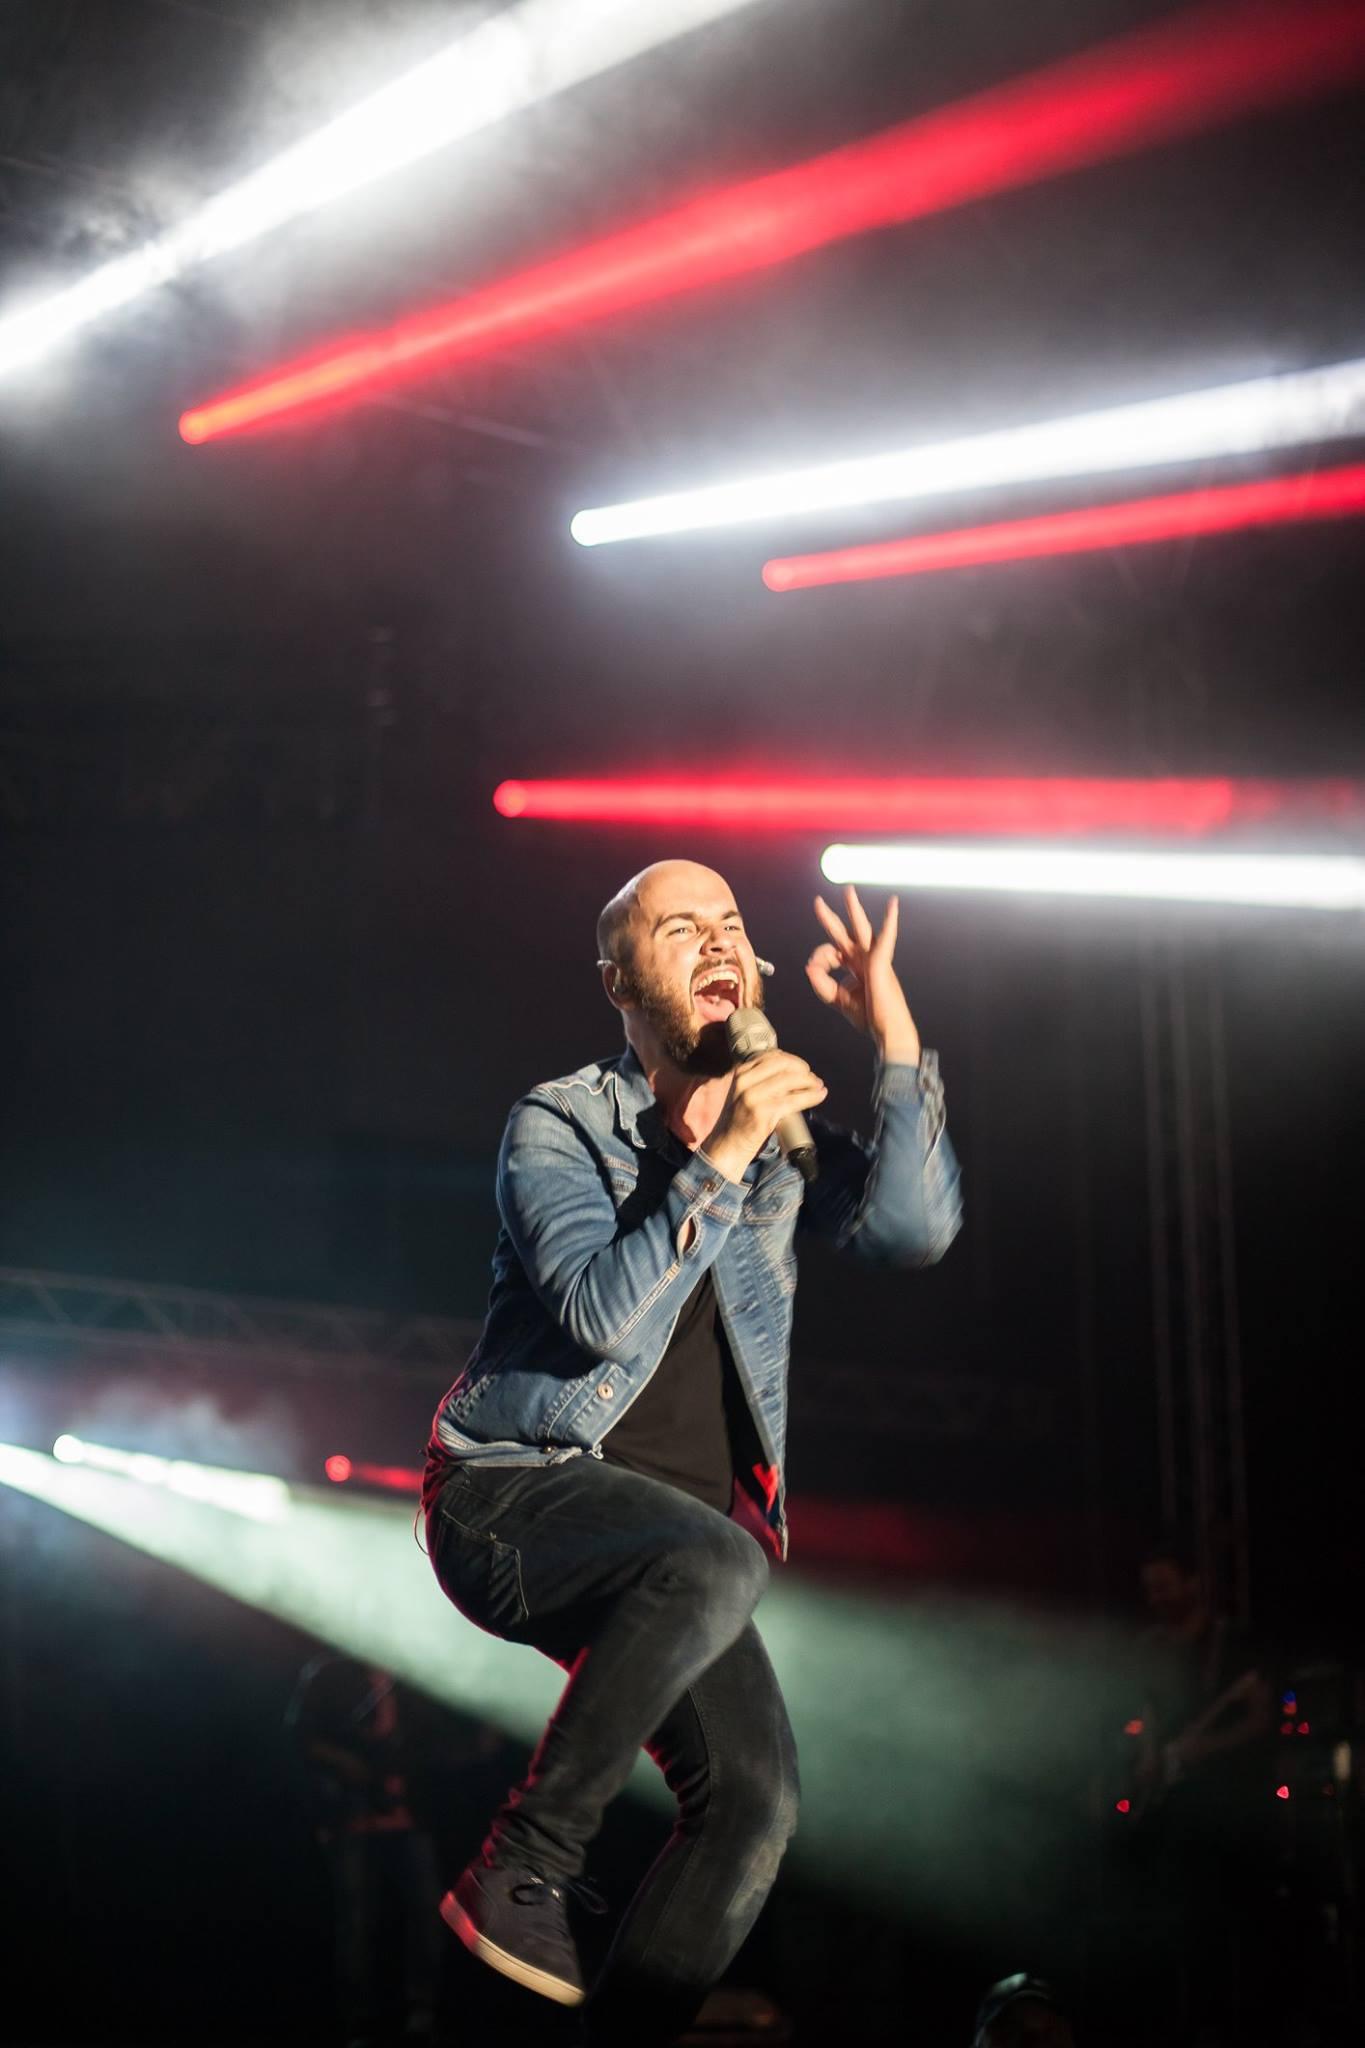 Na Festivale Lumen odohrala kapela No Name